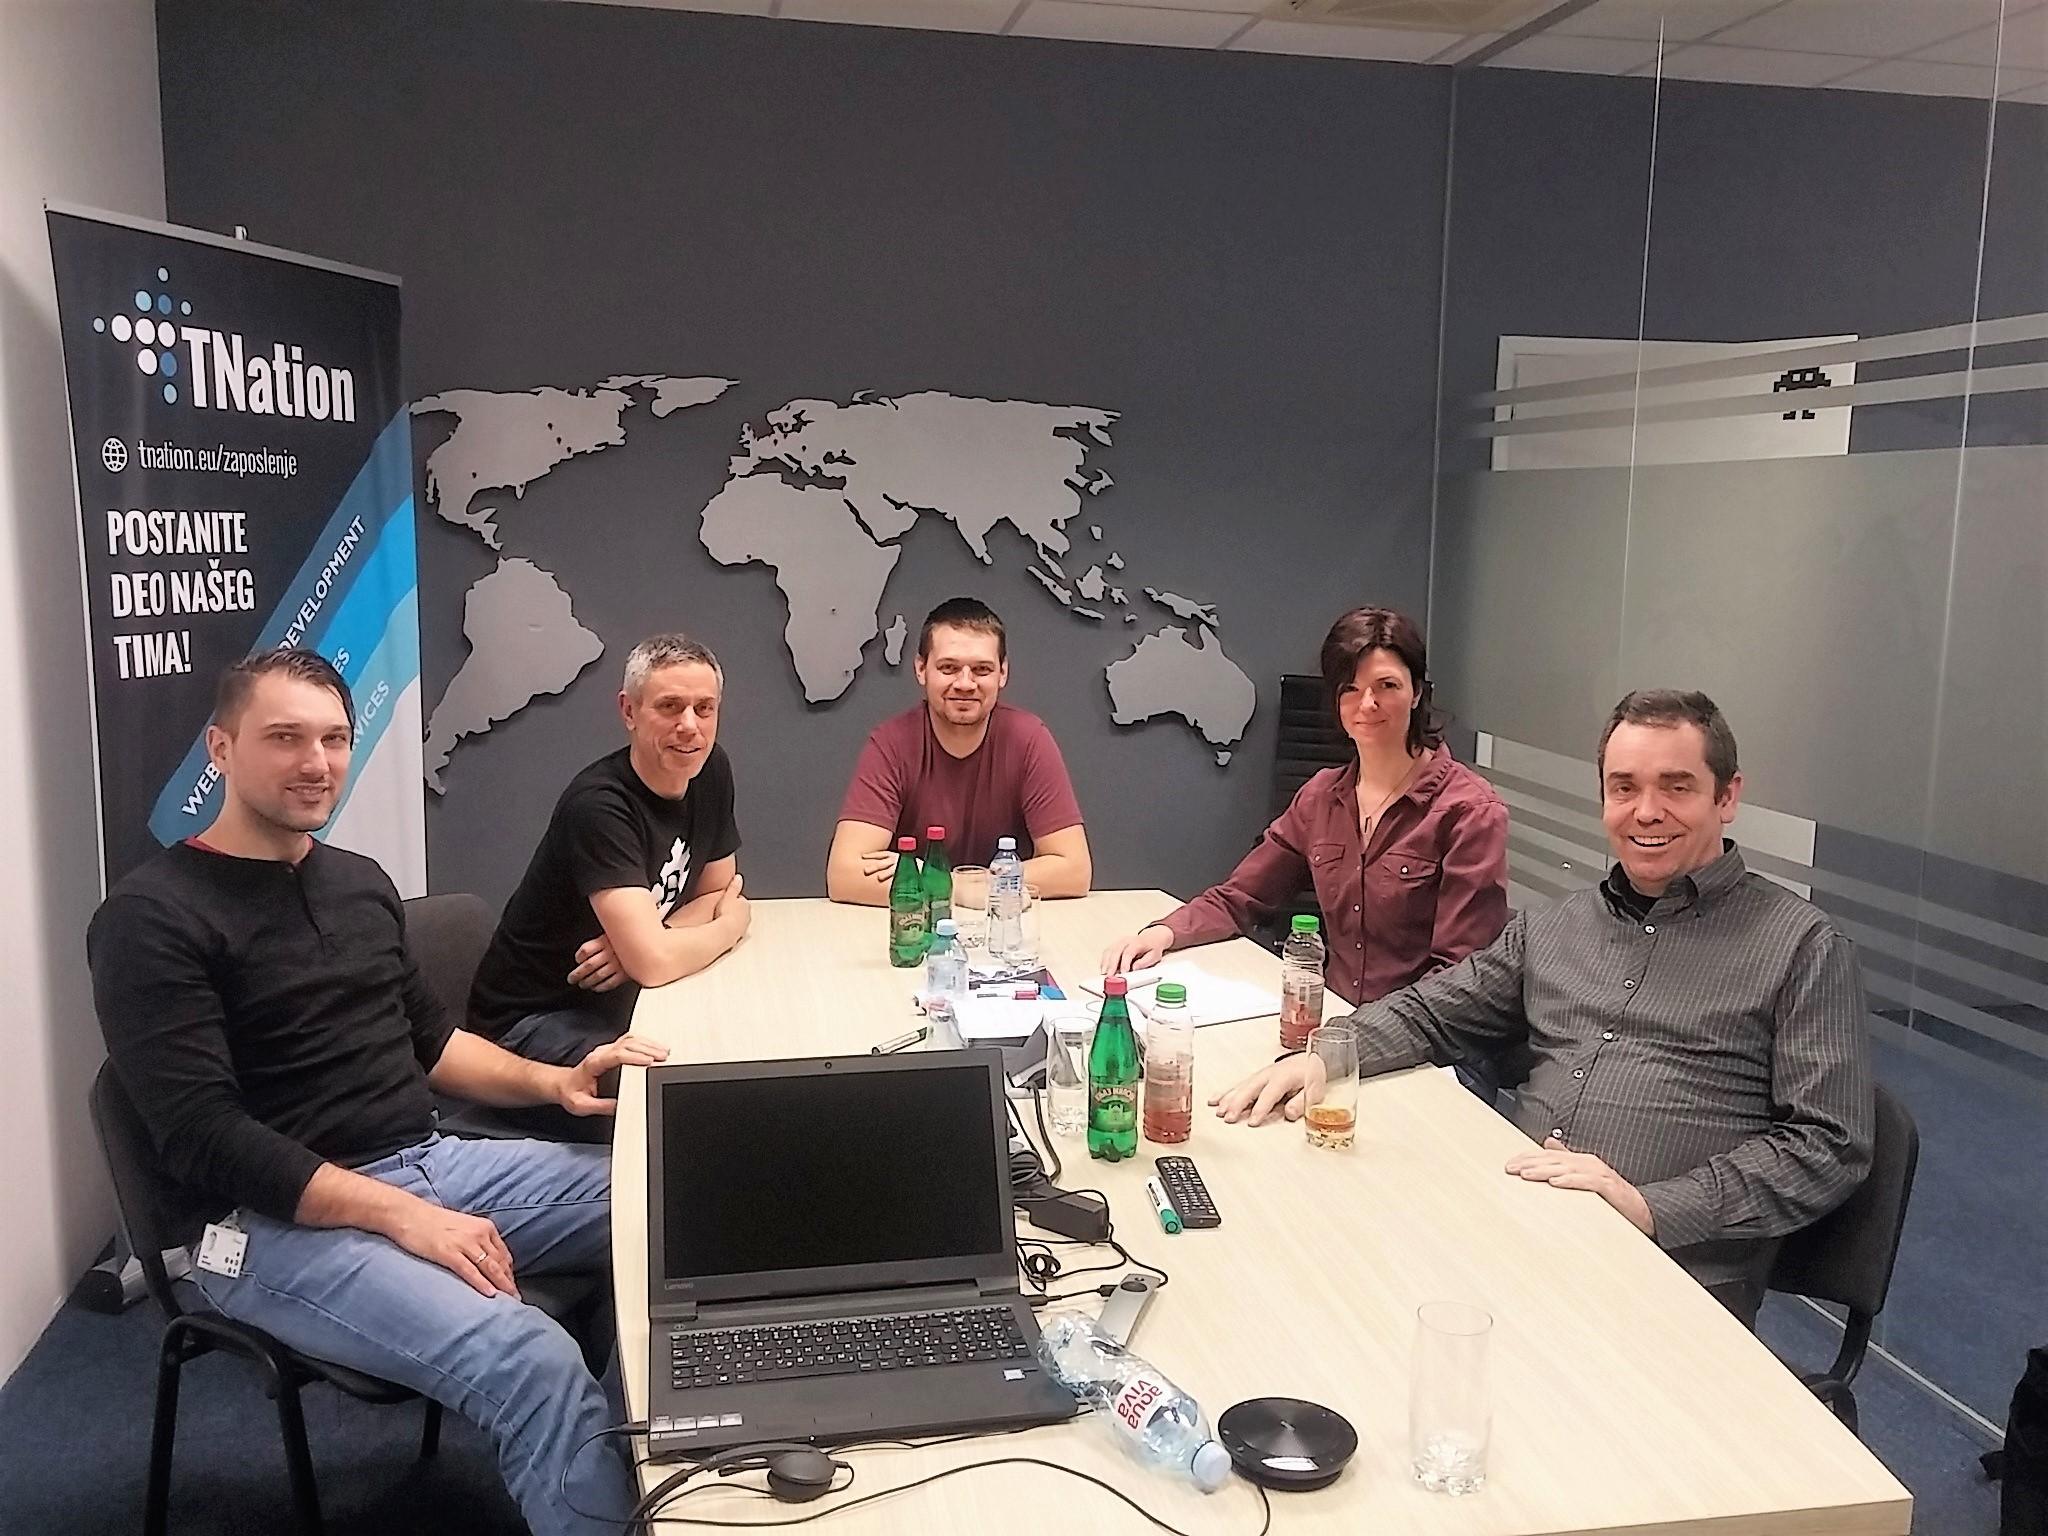 Elkom UK visit in TNation Office